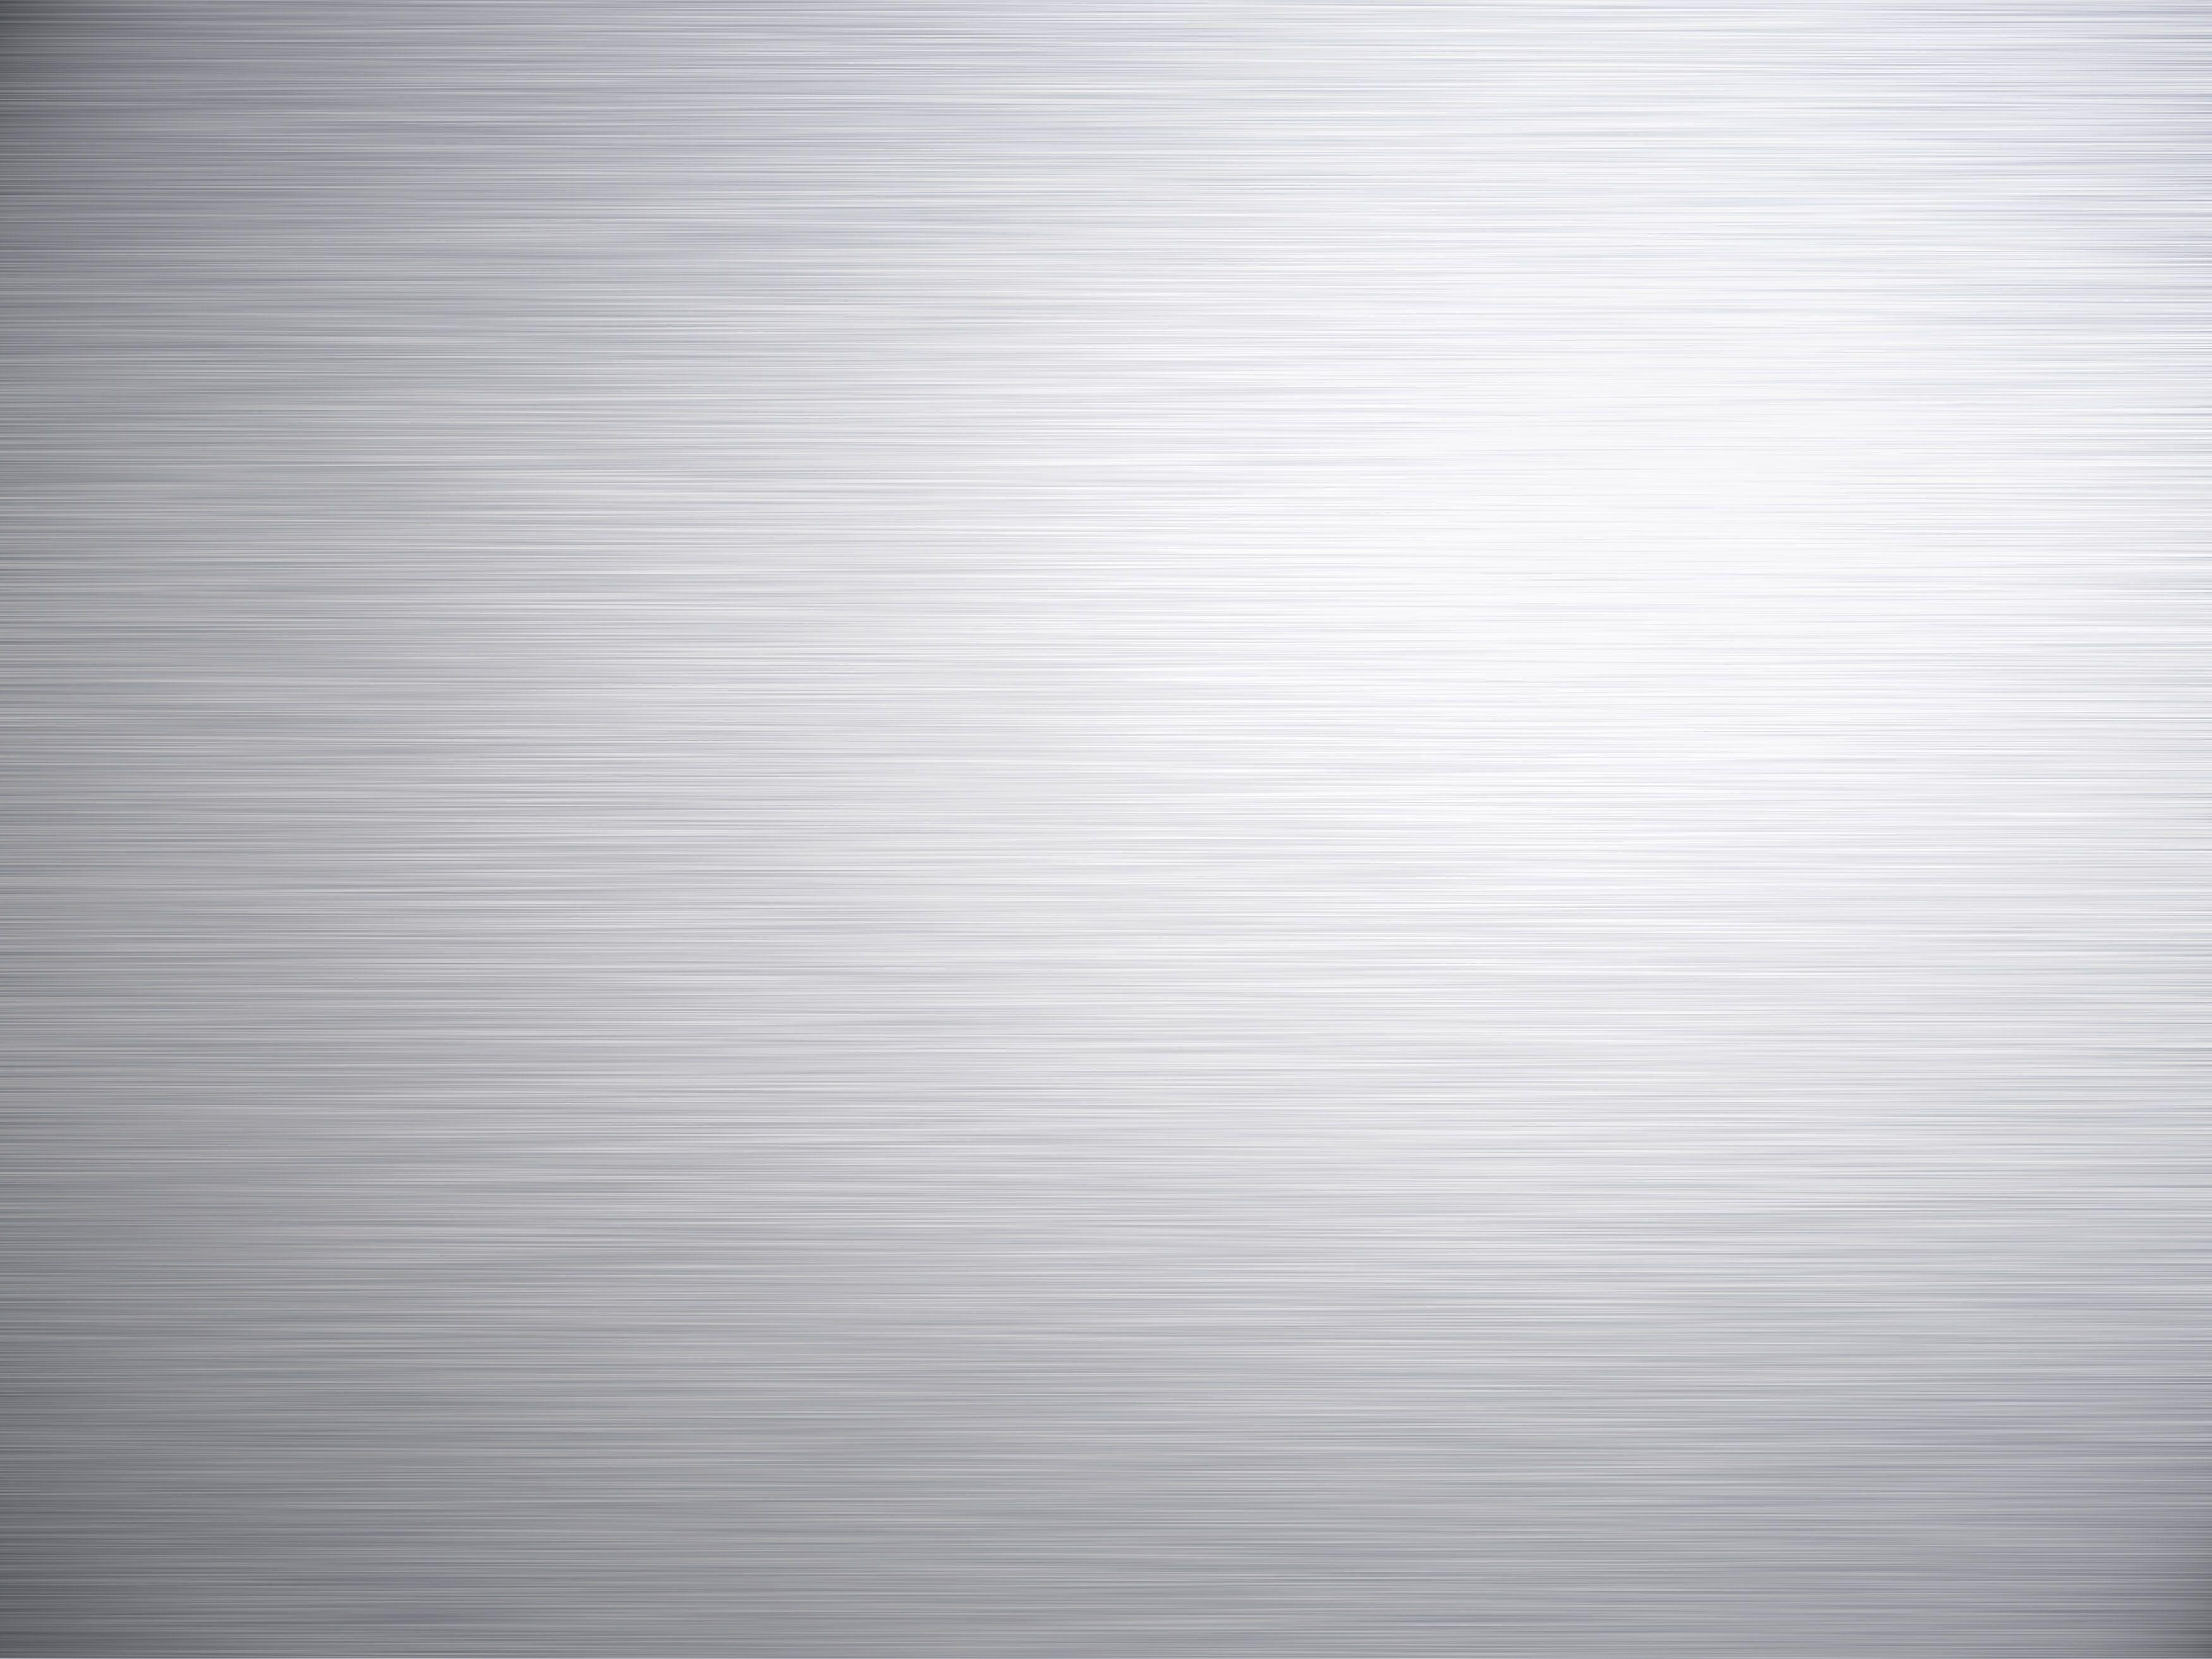 brushed steel or aluminium metal background texture Textures in 3500x2625